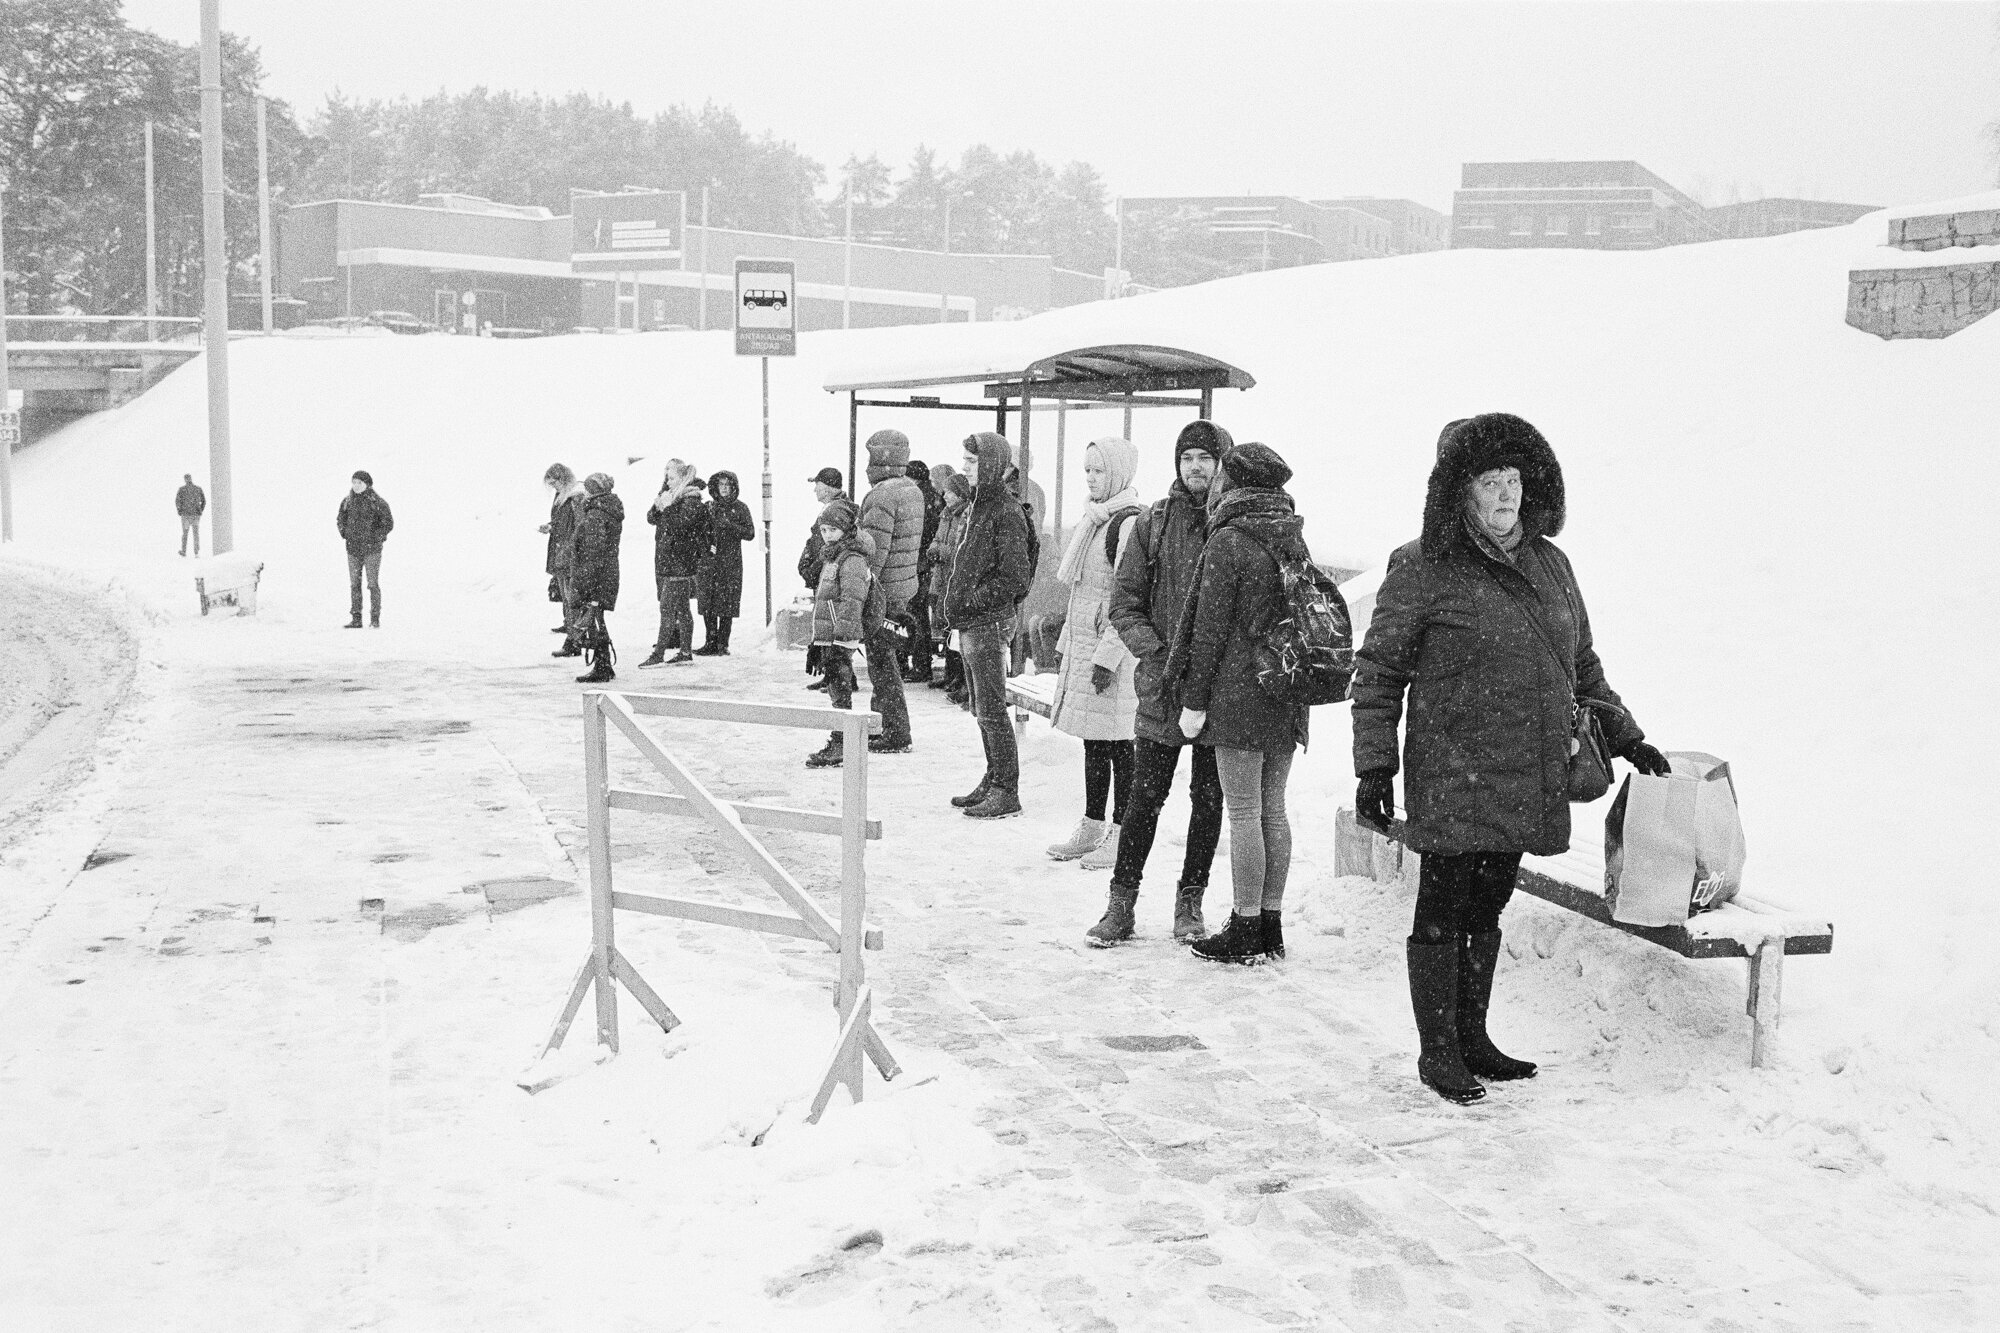 Ignas_Winter-6.jpg